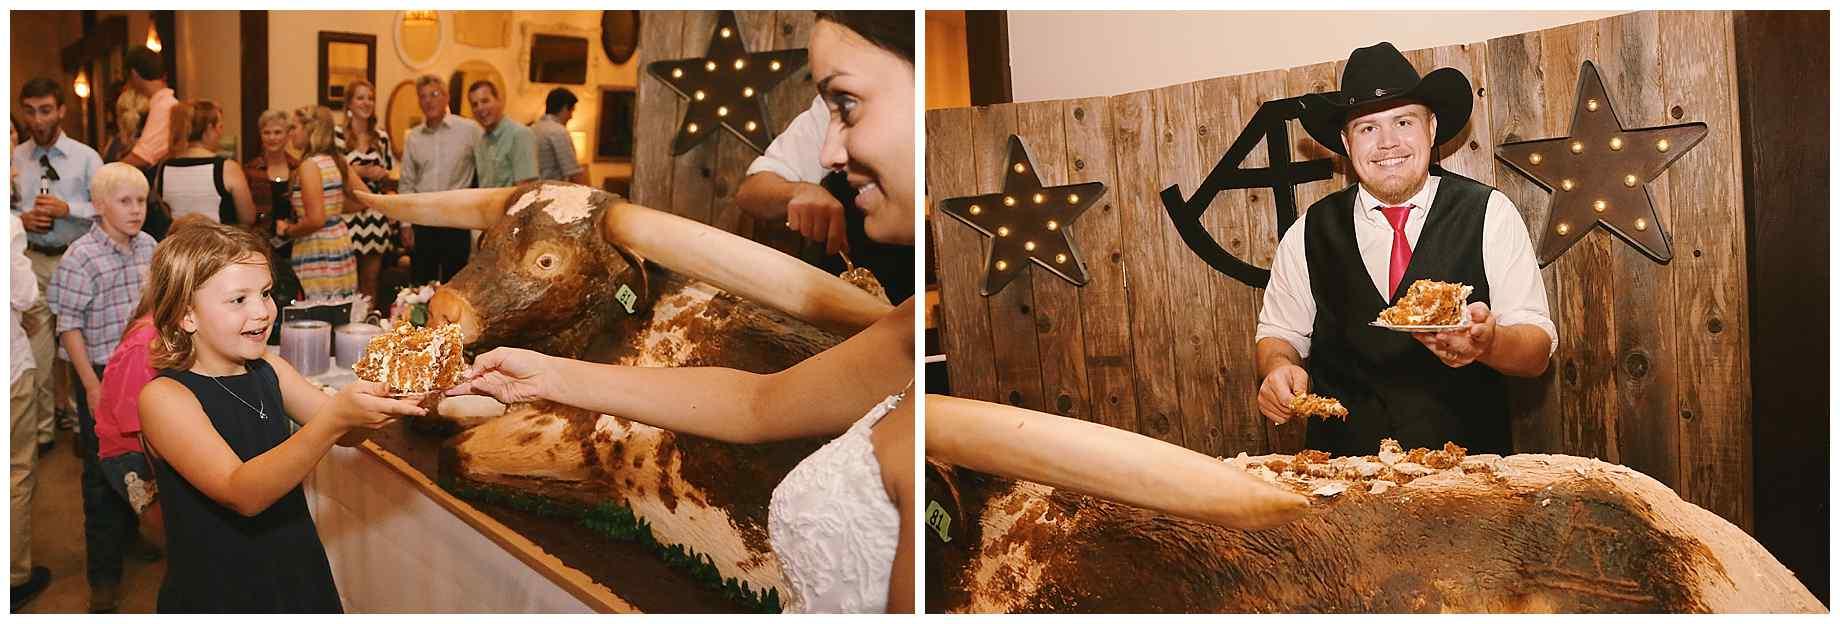 pecan-springs-ranch-austin-tx-wedding-022